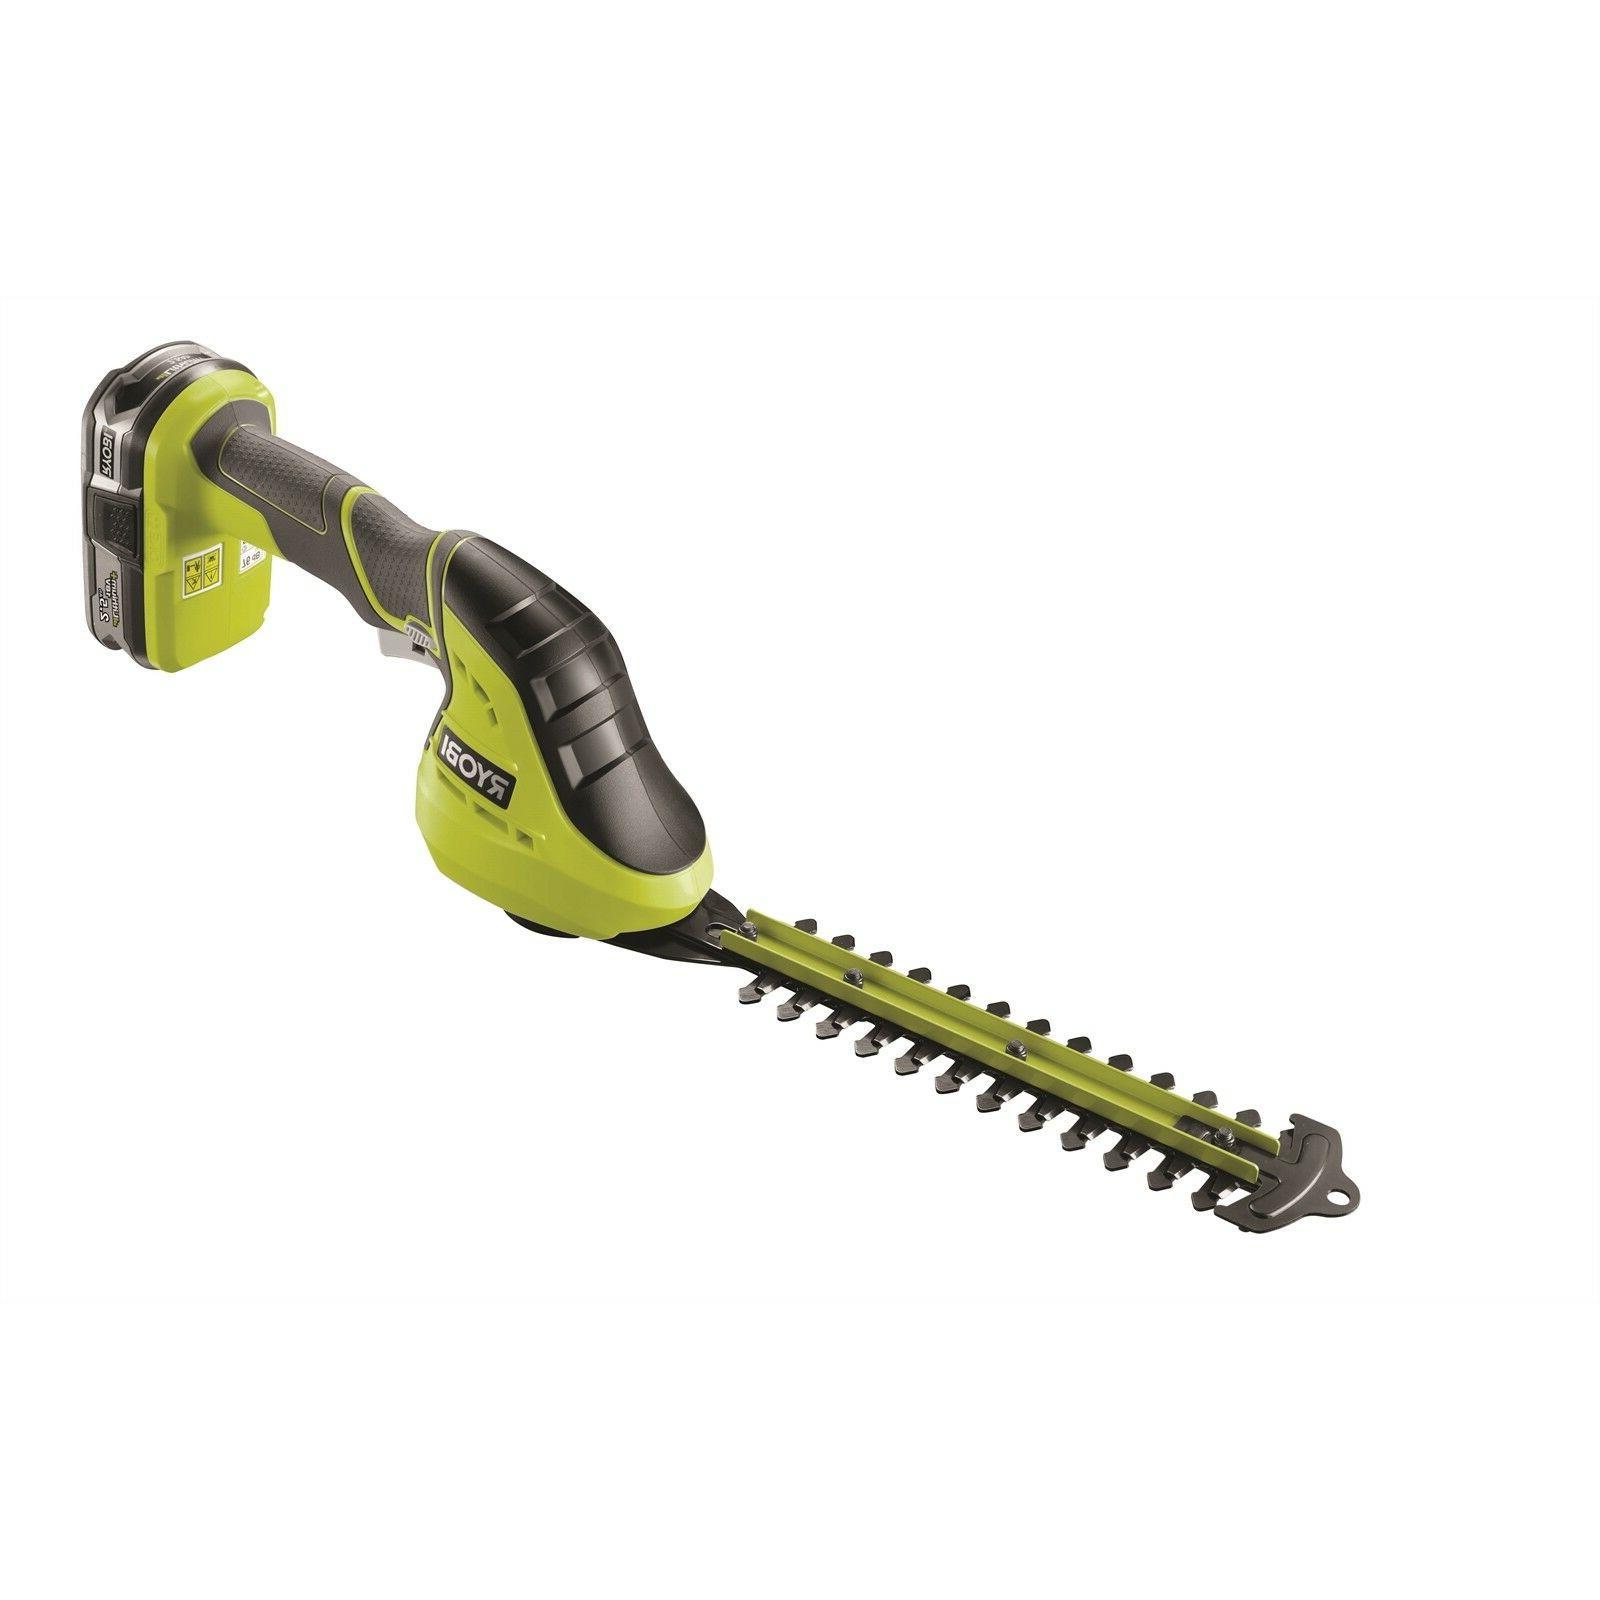 Bosch 18V Cordless Easy Hedge Cut Hedge Trimmer 18